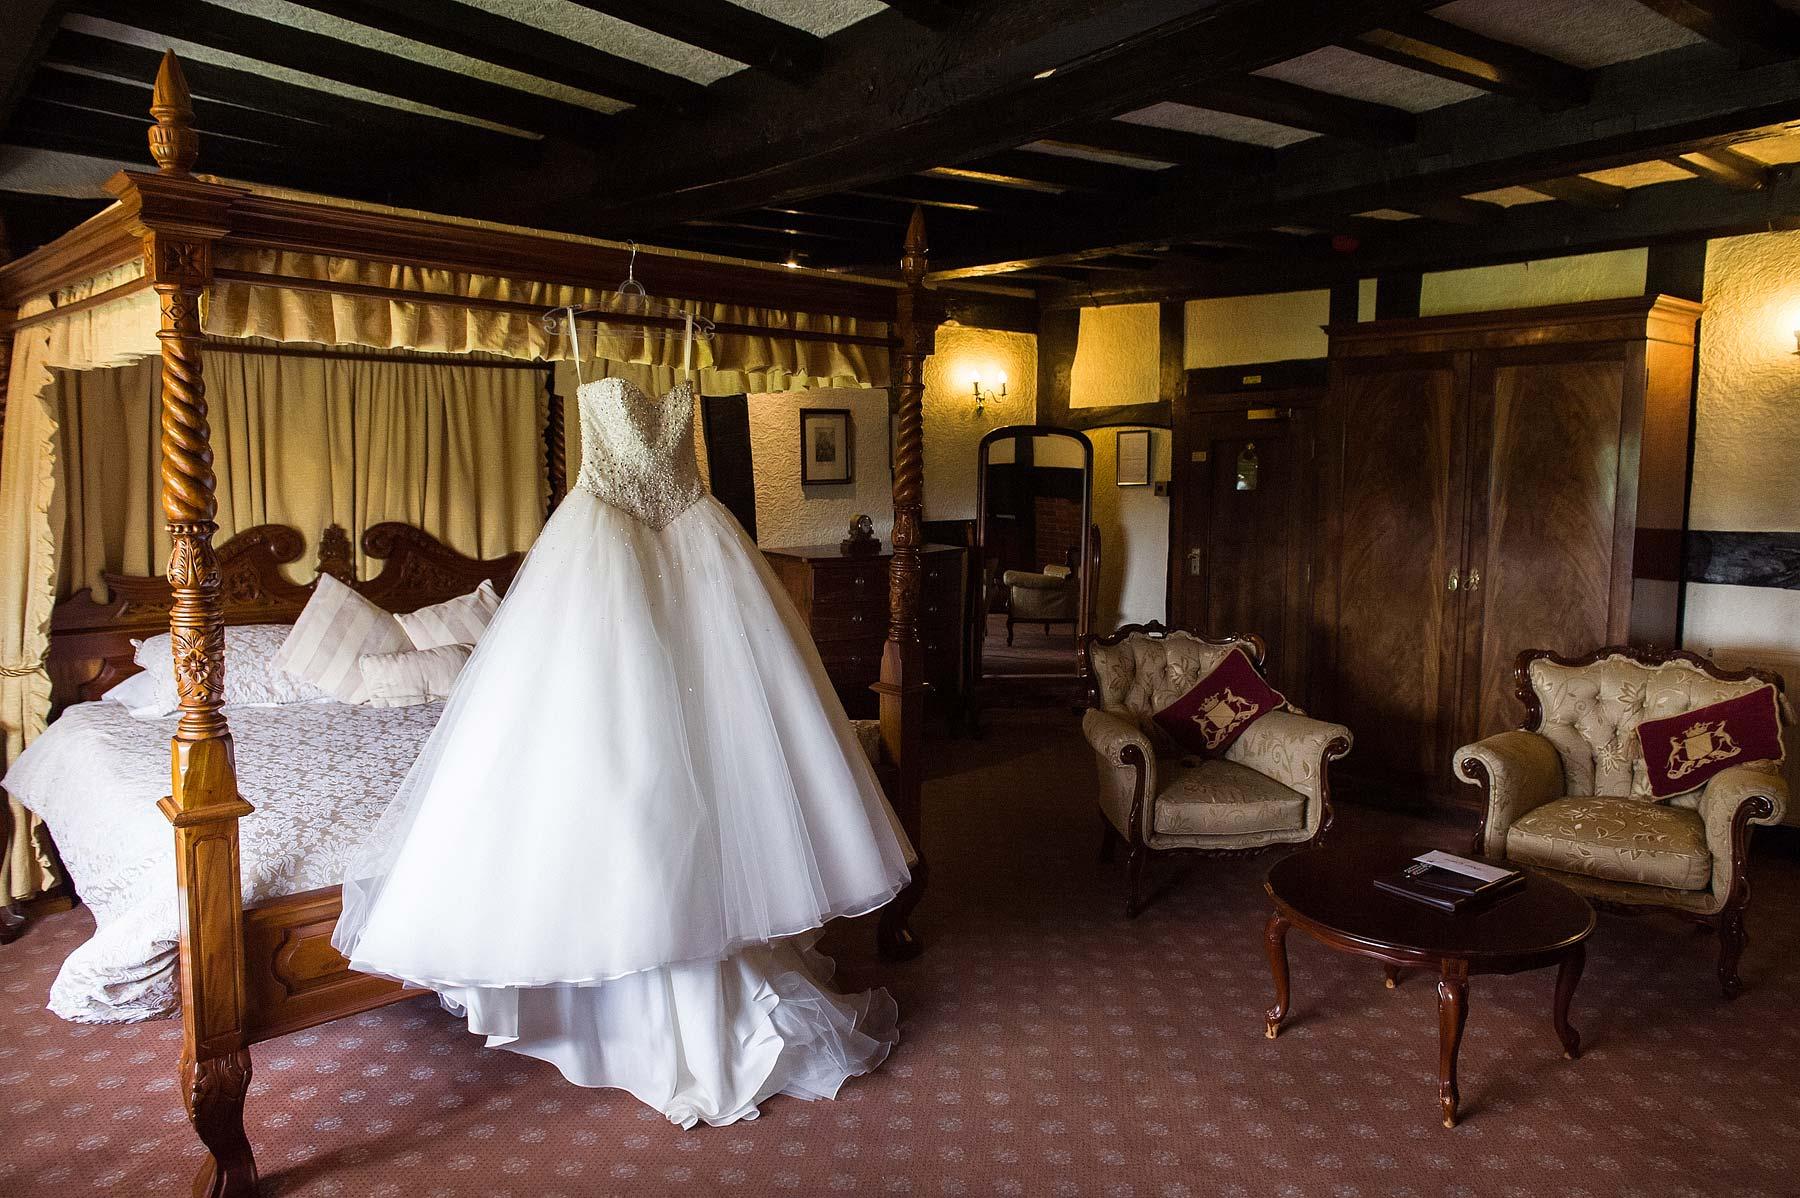 albright-hussey-manor-wedding-photographers-003